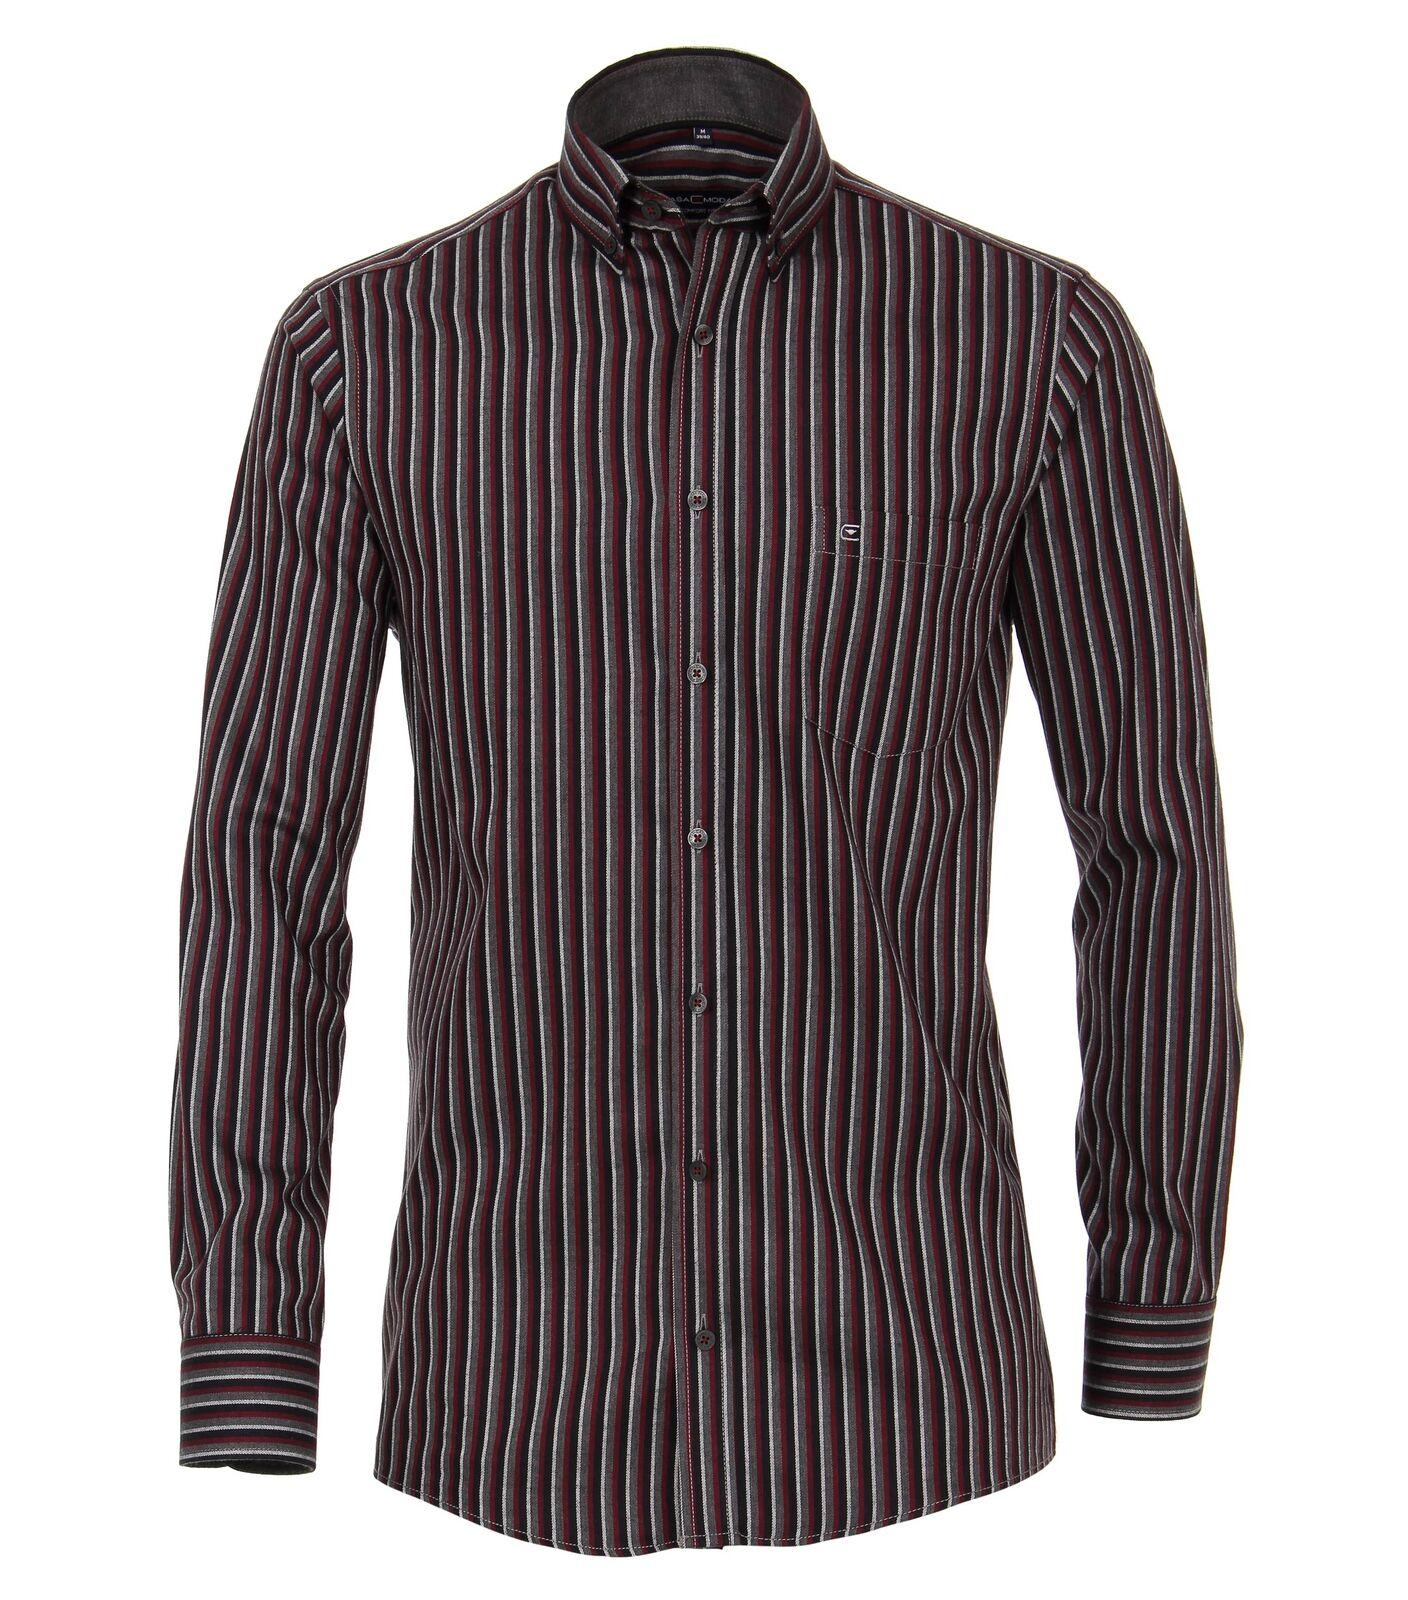 Casa Moda-Comfort Fit-Hommes manches longues Button-Down chemise rayé (483090800) (483090800) (483090800) 9679b0